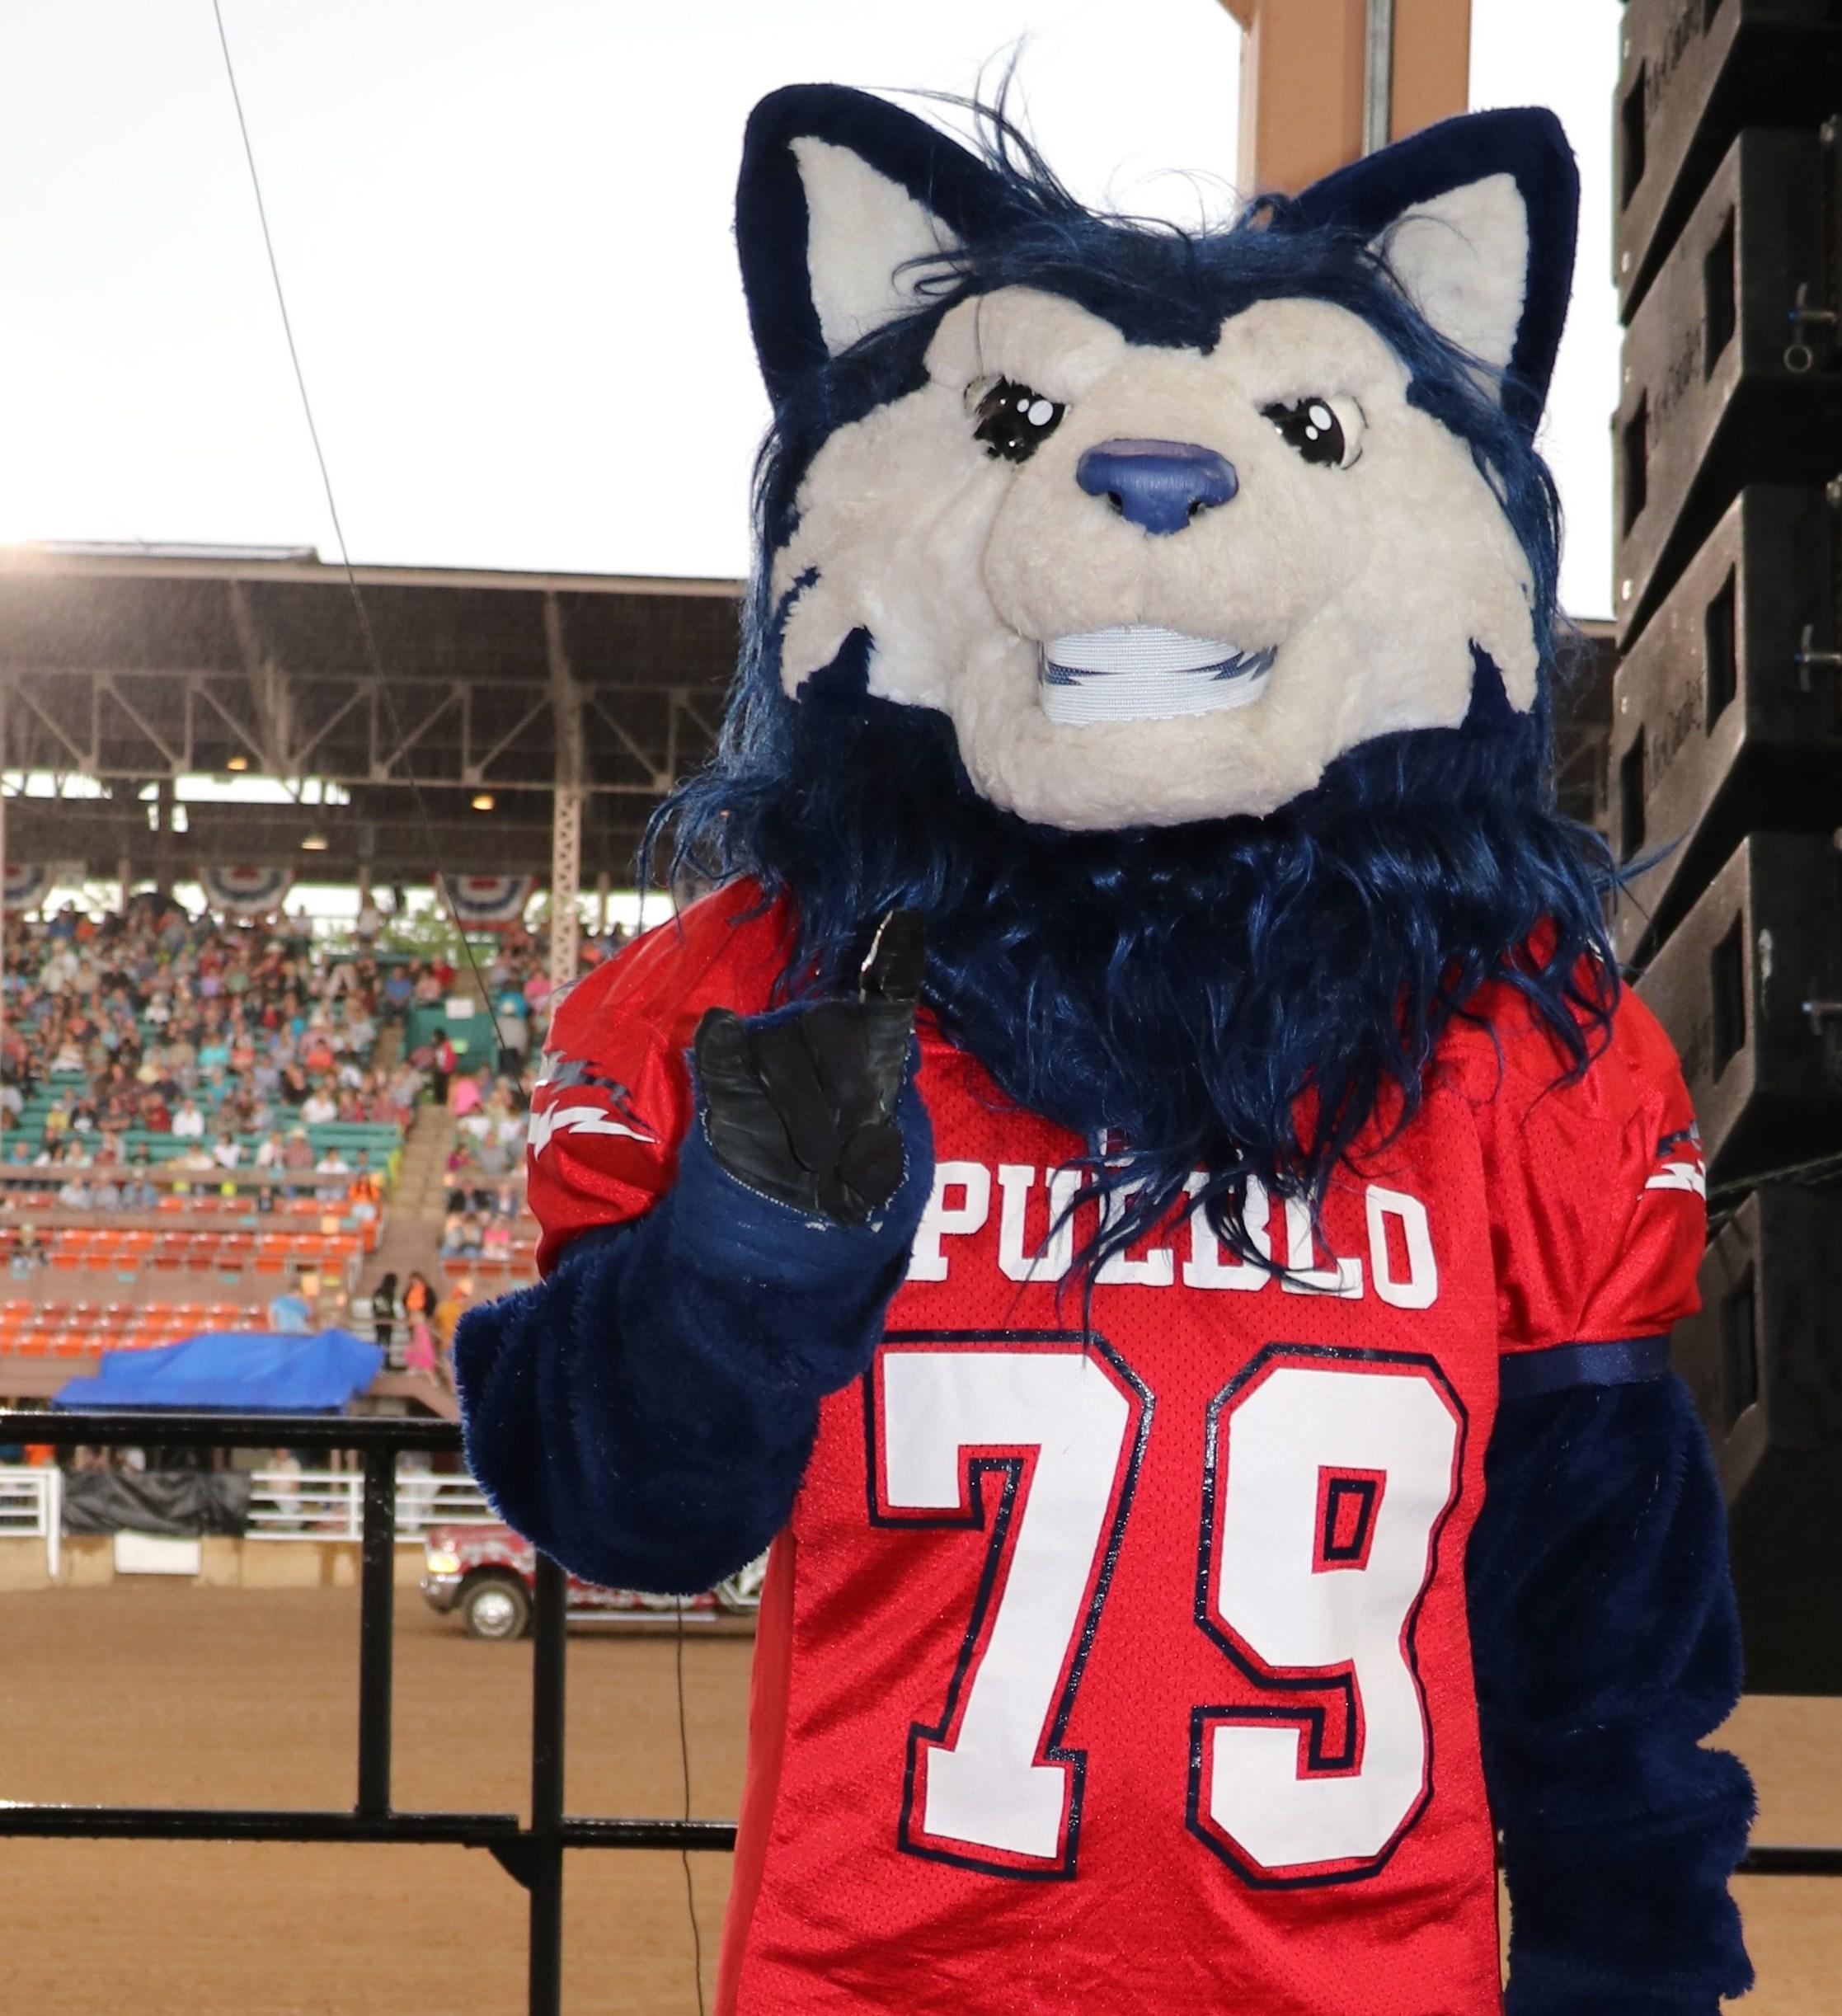 official photos c633f 86866 CSU-Pueblo hosts alumni rodeo at 2016 Colorado State Fair ...